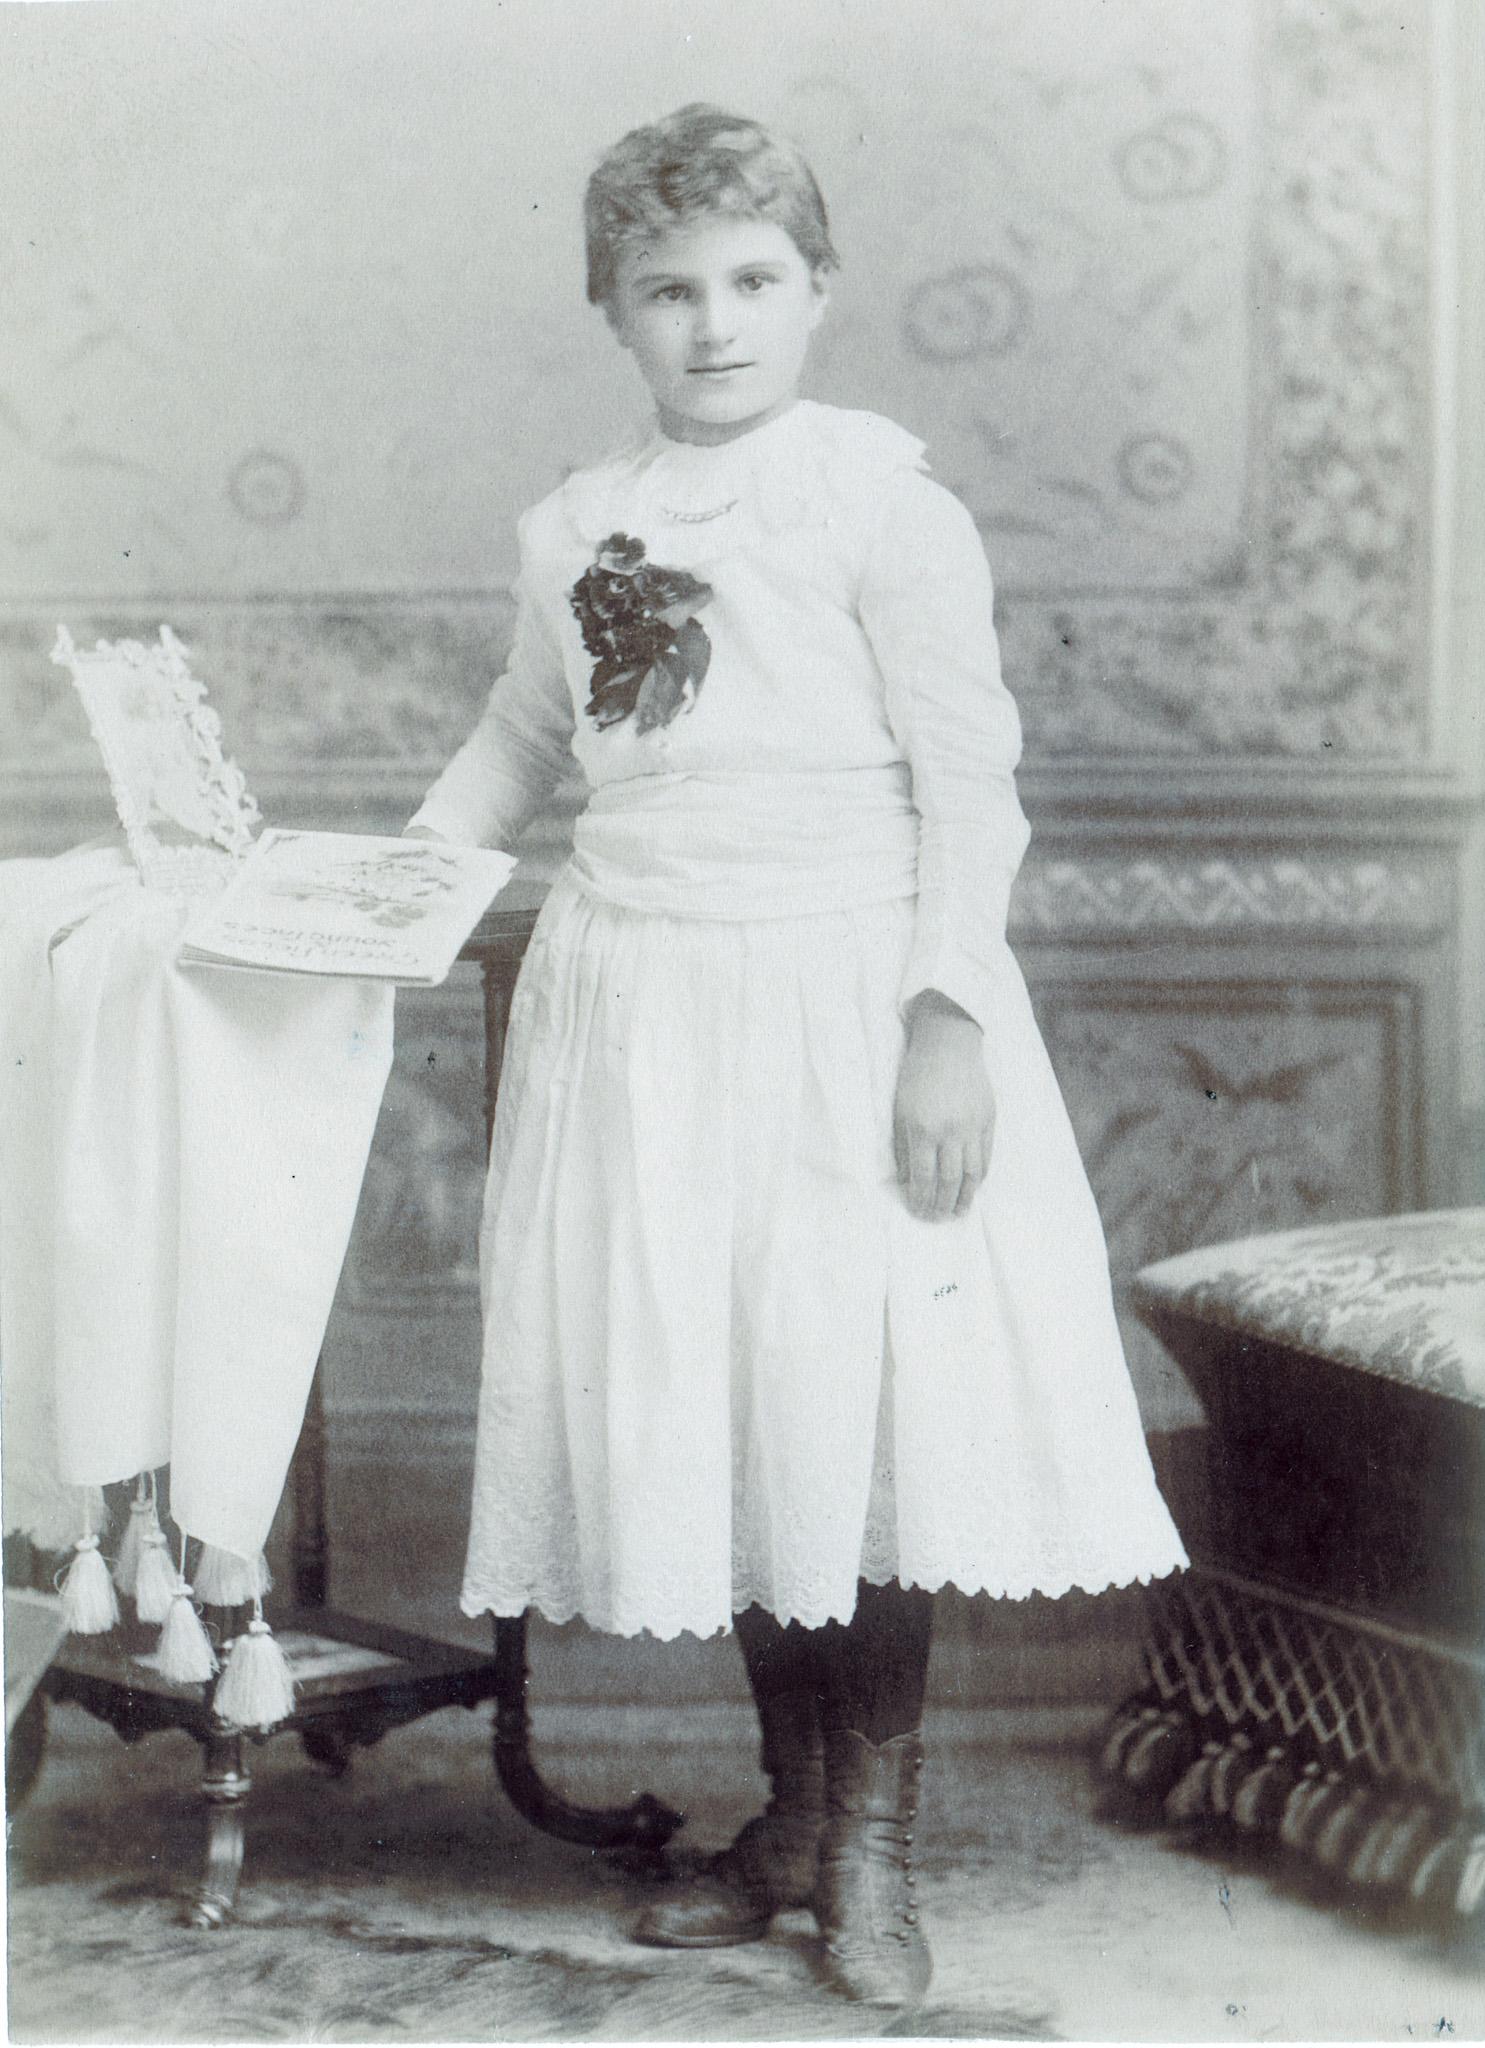 Gertrude Nicklos